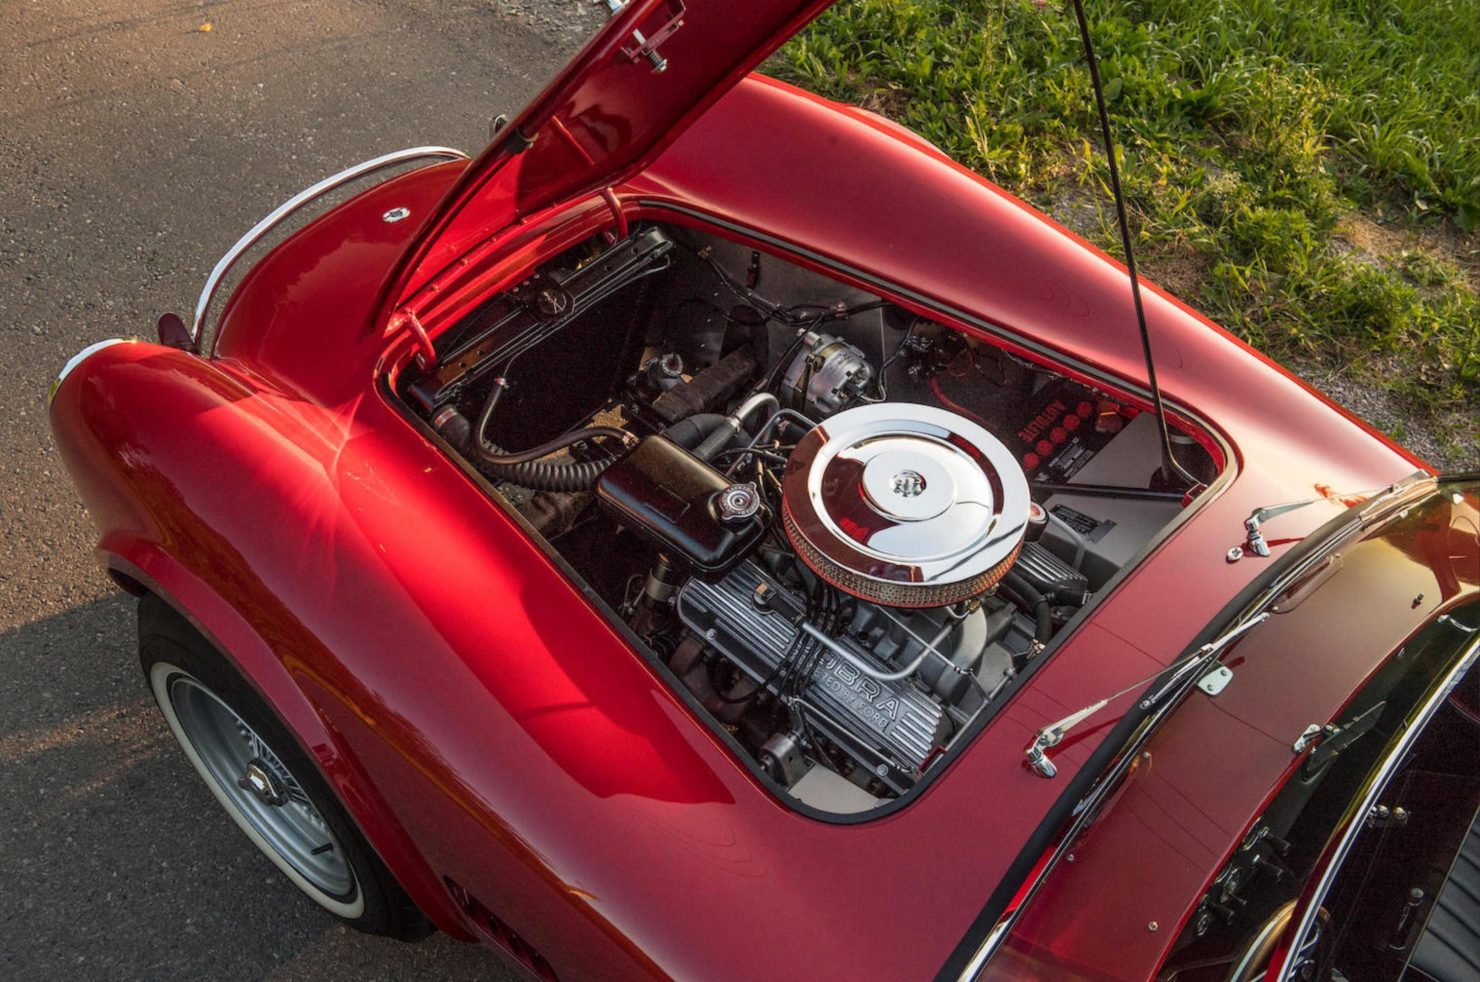 shelby ac cobra 289 12 1480x982 - 1964 Shelby AC Cobra 289